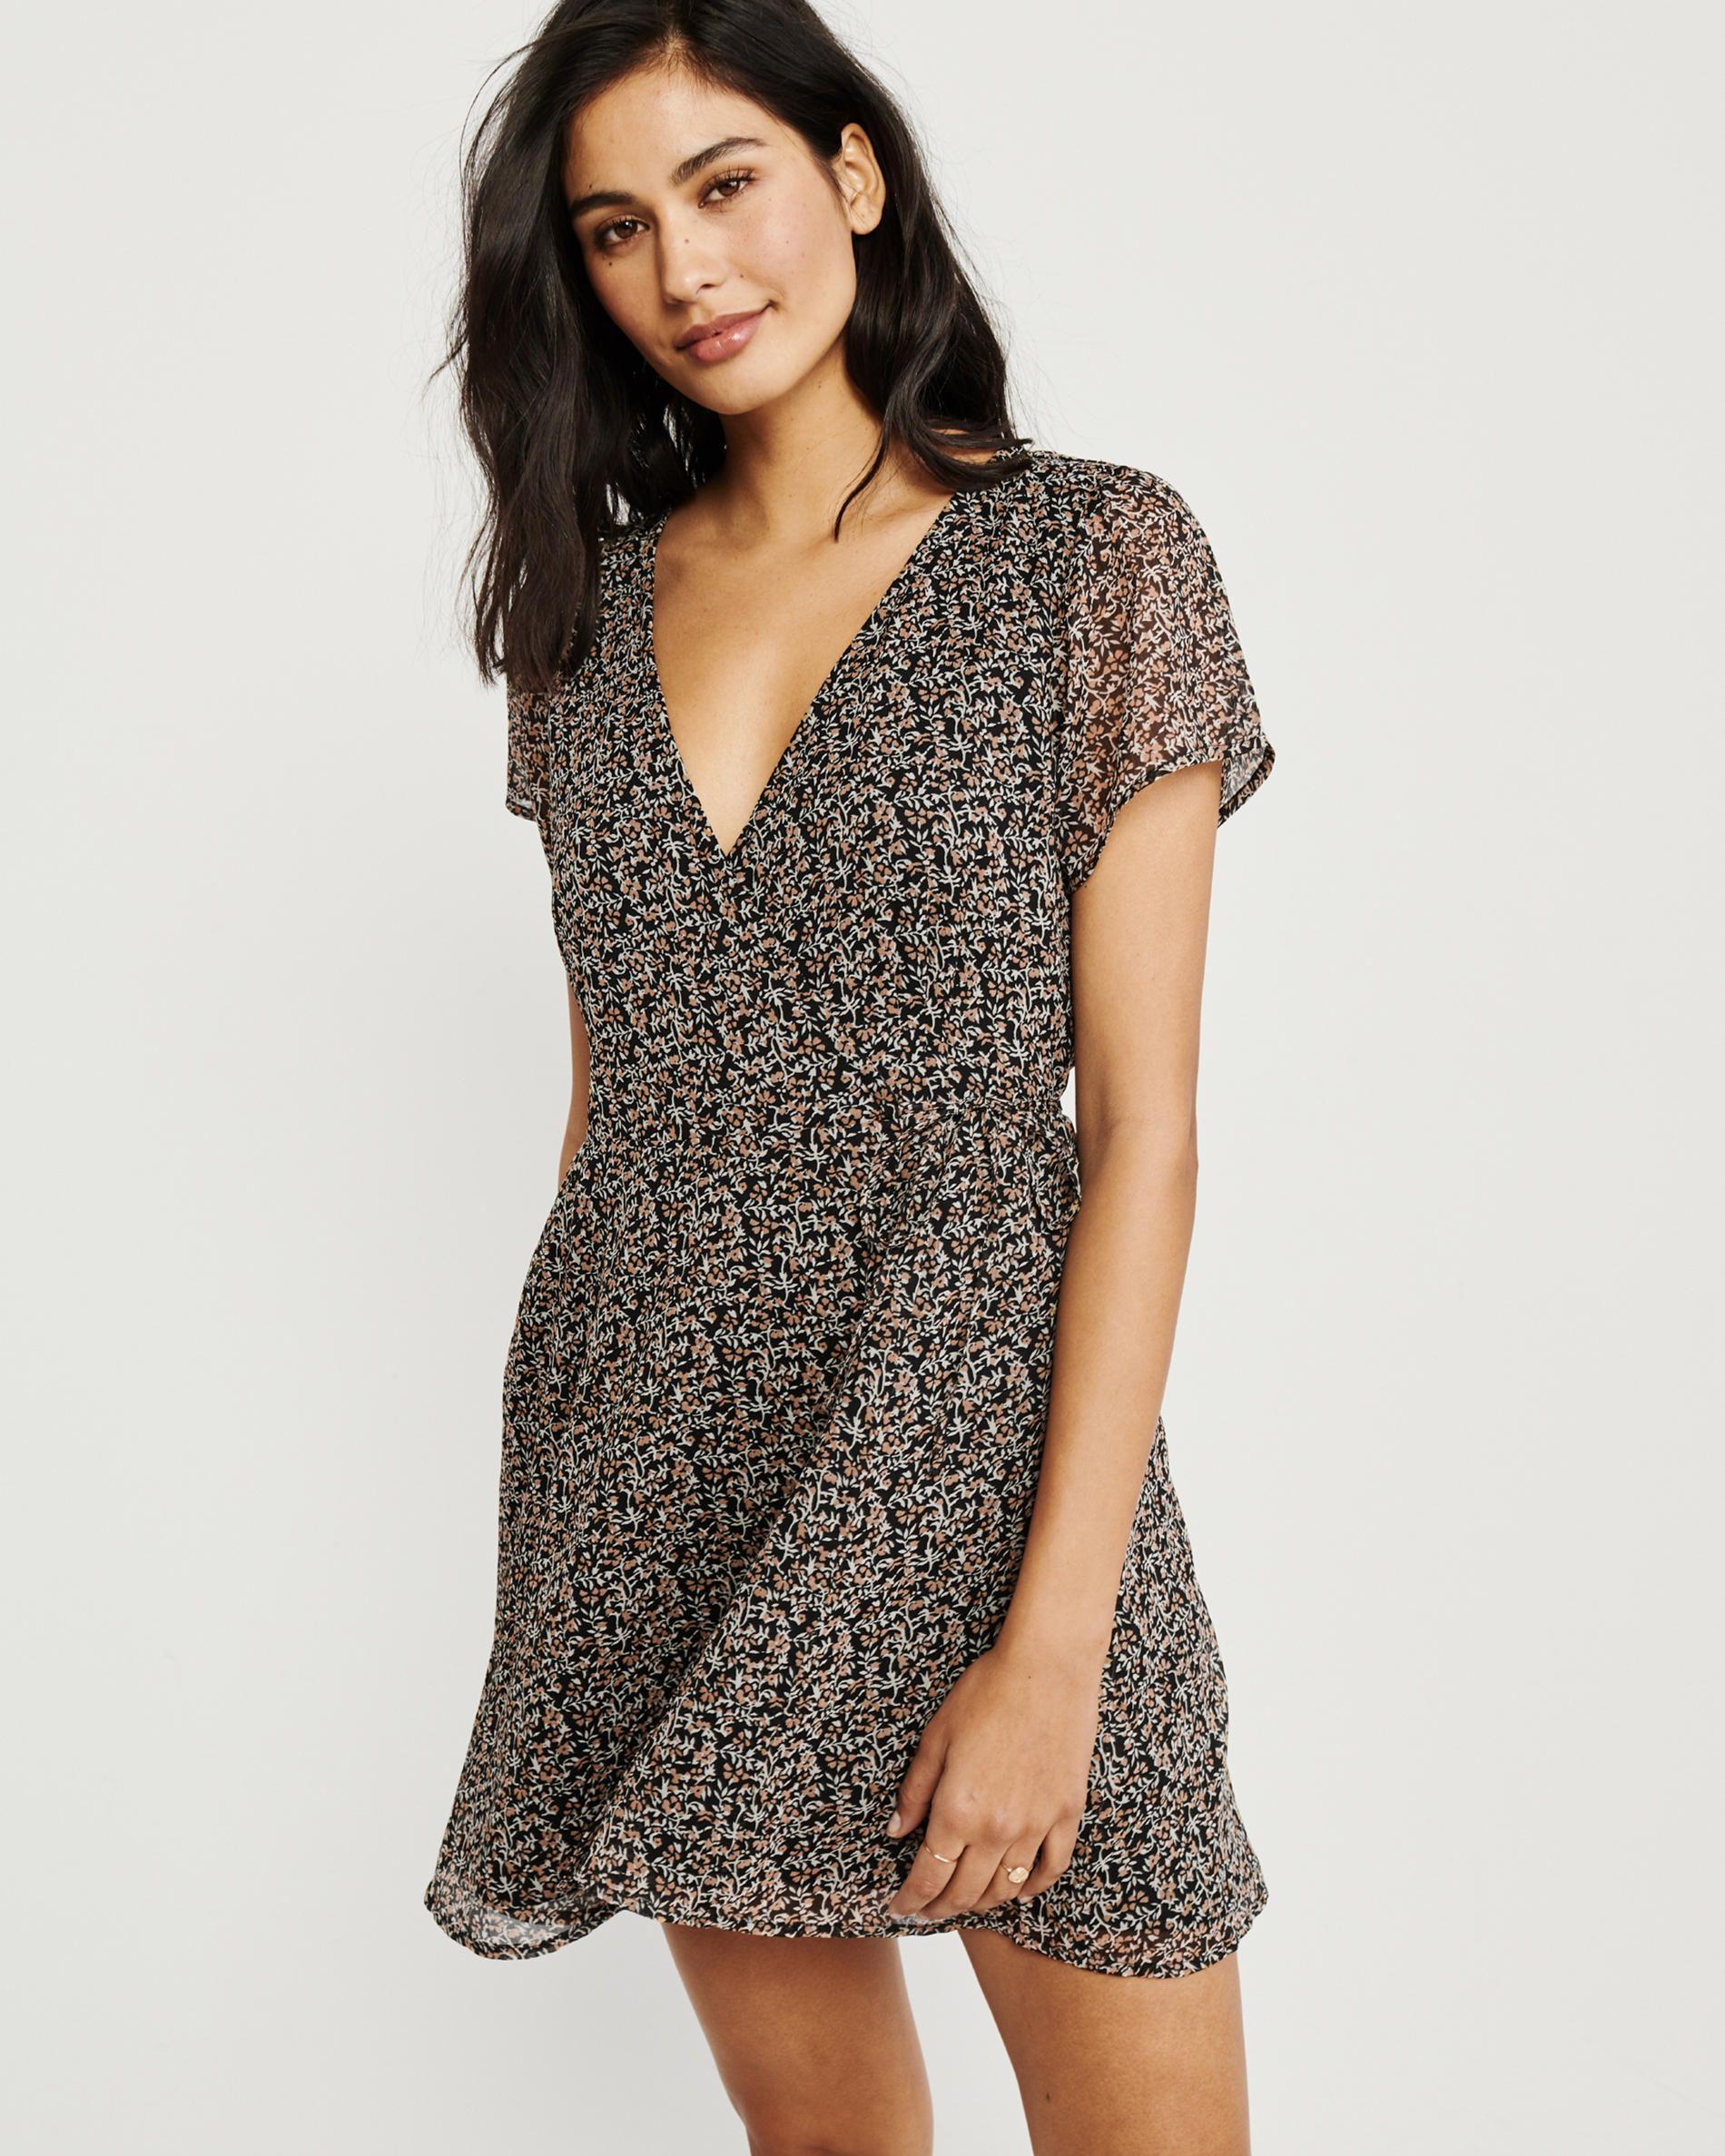 47++ Short sleeve wrap dress information